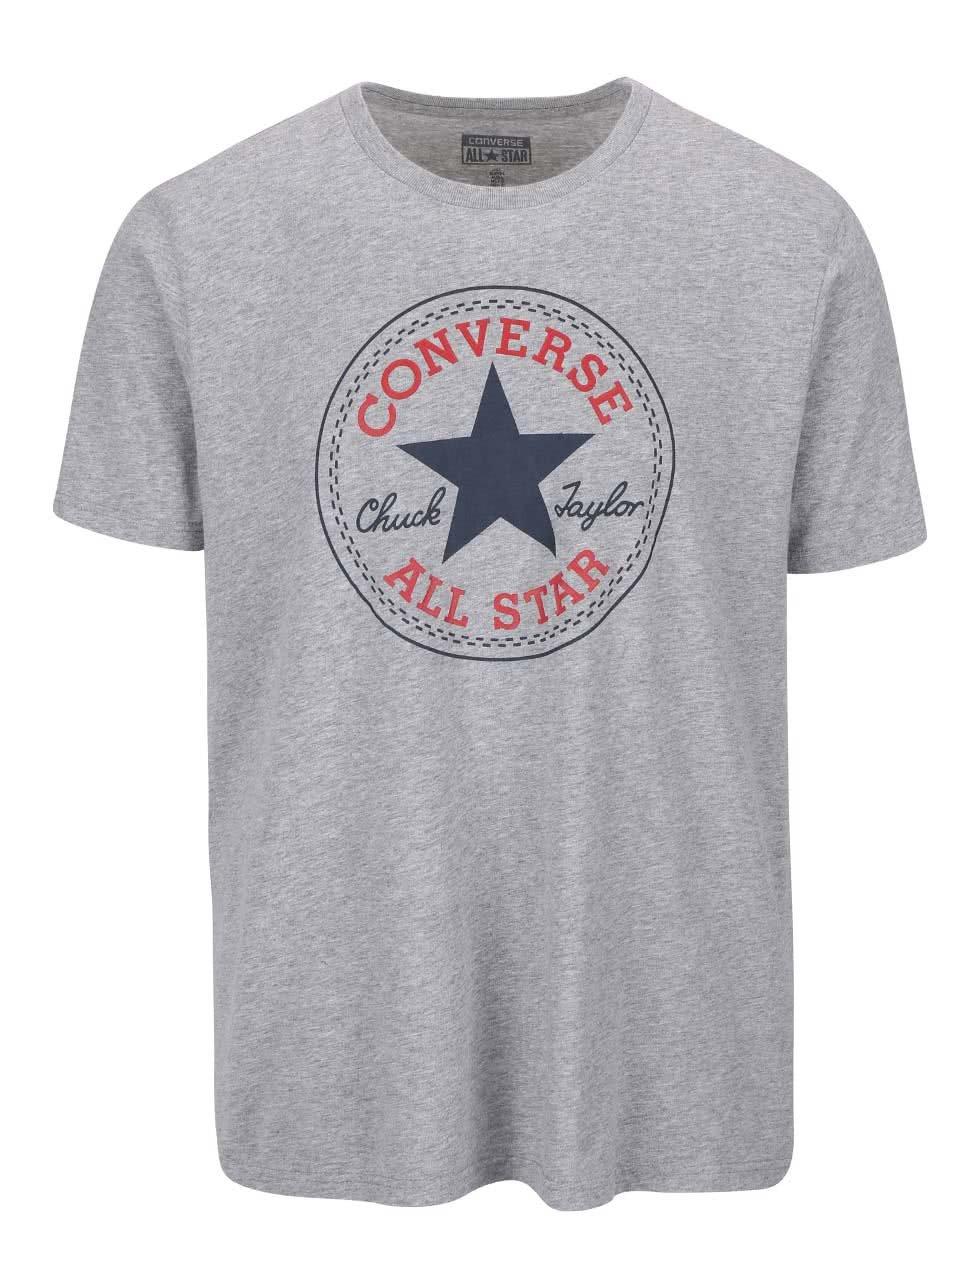 Šedé pánské triko s logem Converse